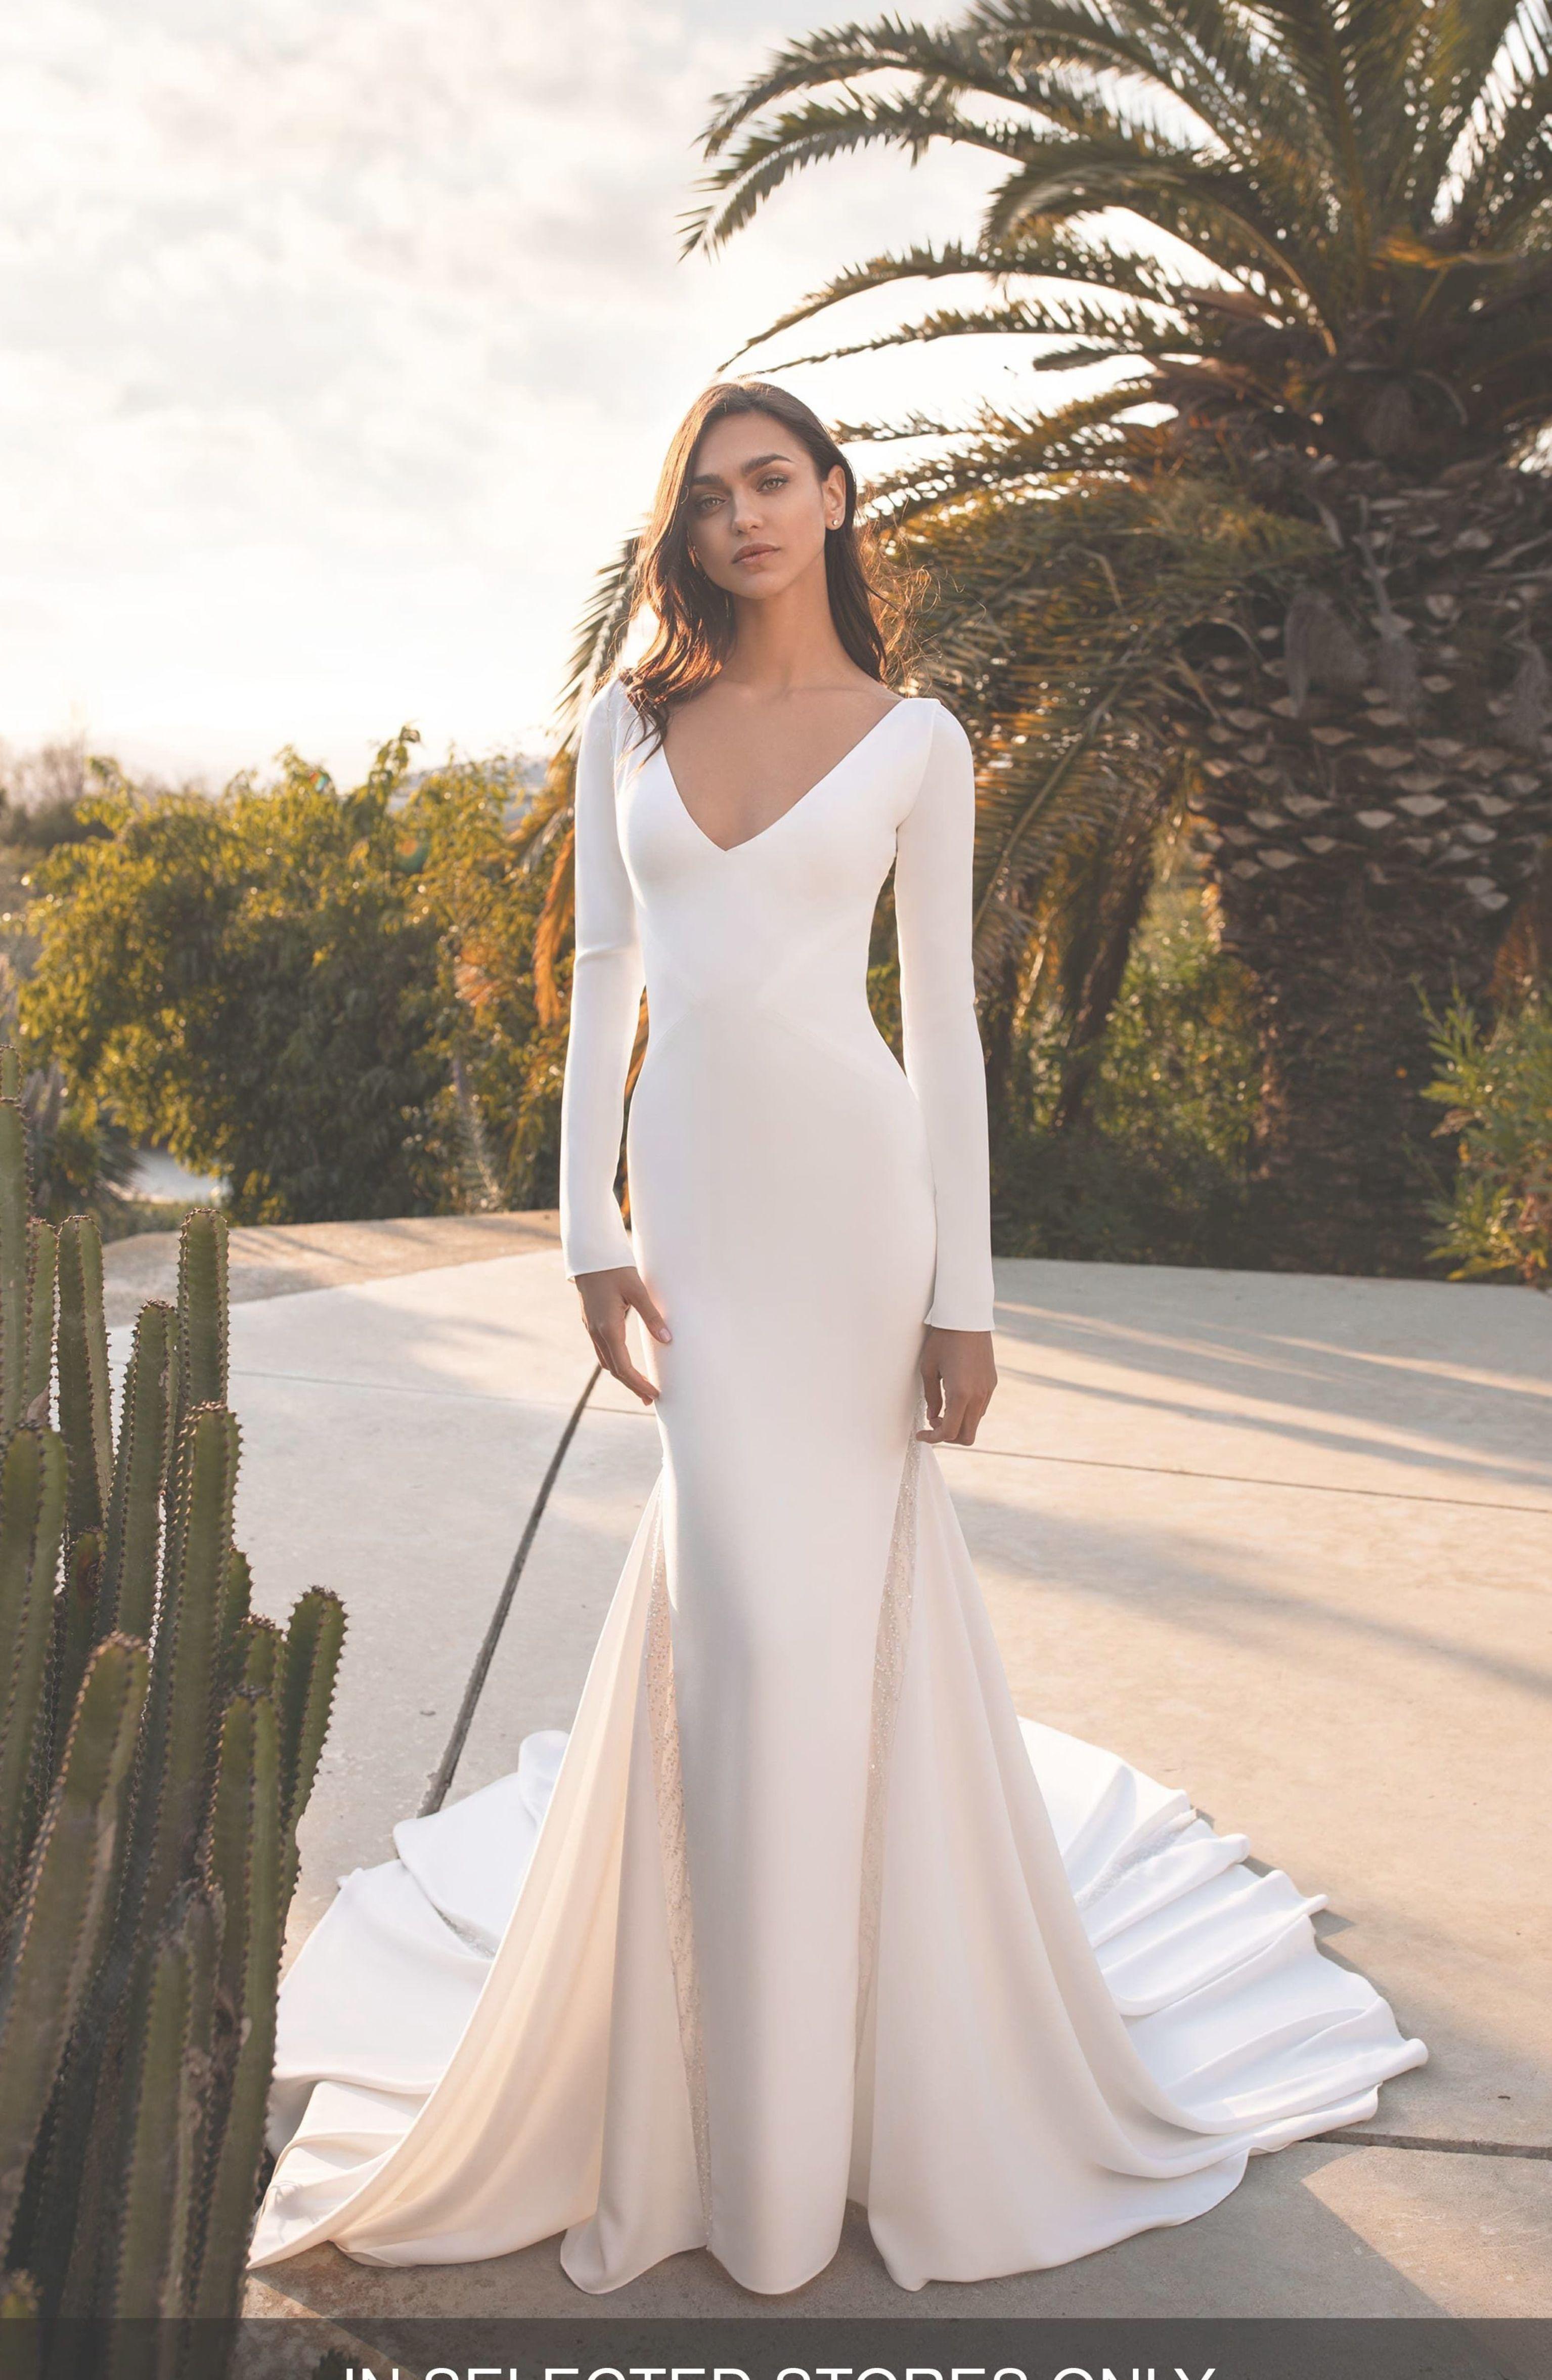 Women S Pronovias Bianca Embellished Inset Long Sleeve Crepe Trumpet Wedding Dress Size Online Wedding Dress Trumpet Wedding Dress Wedding Dress Long Sleeve